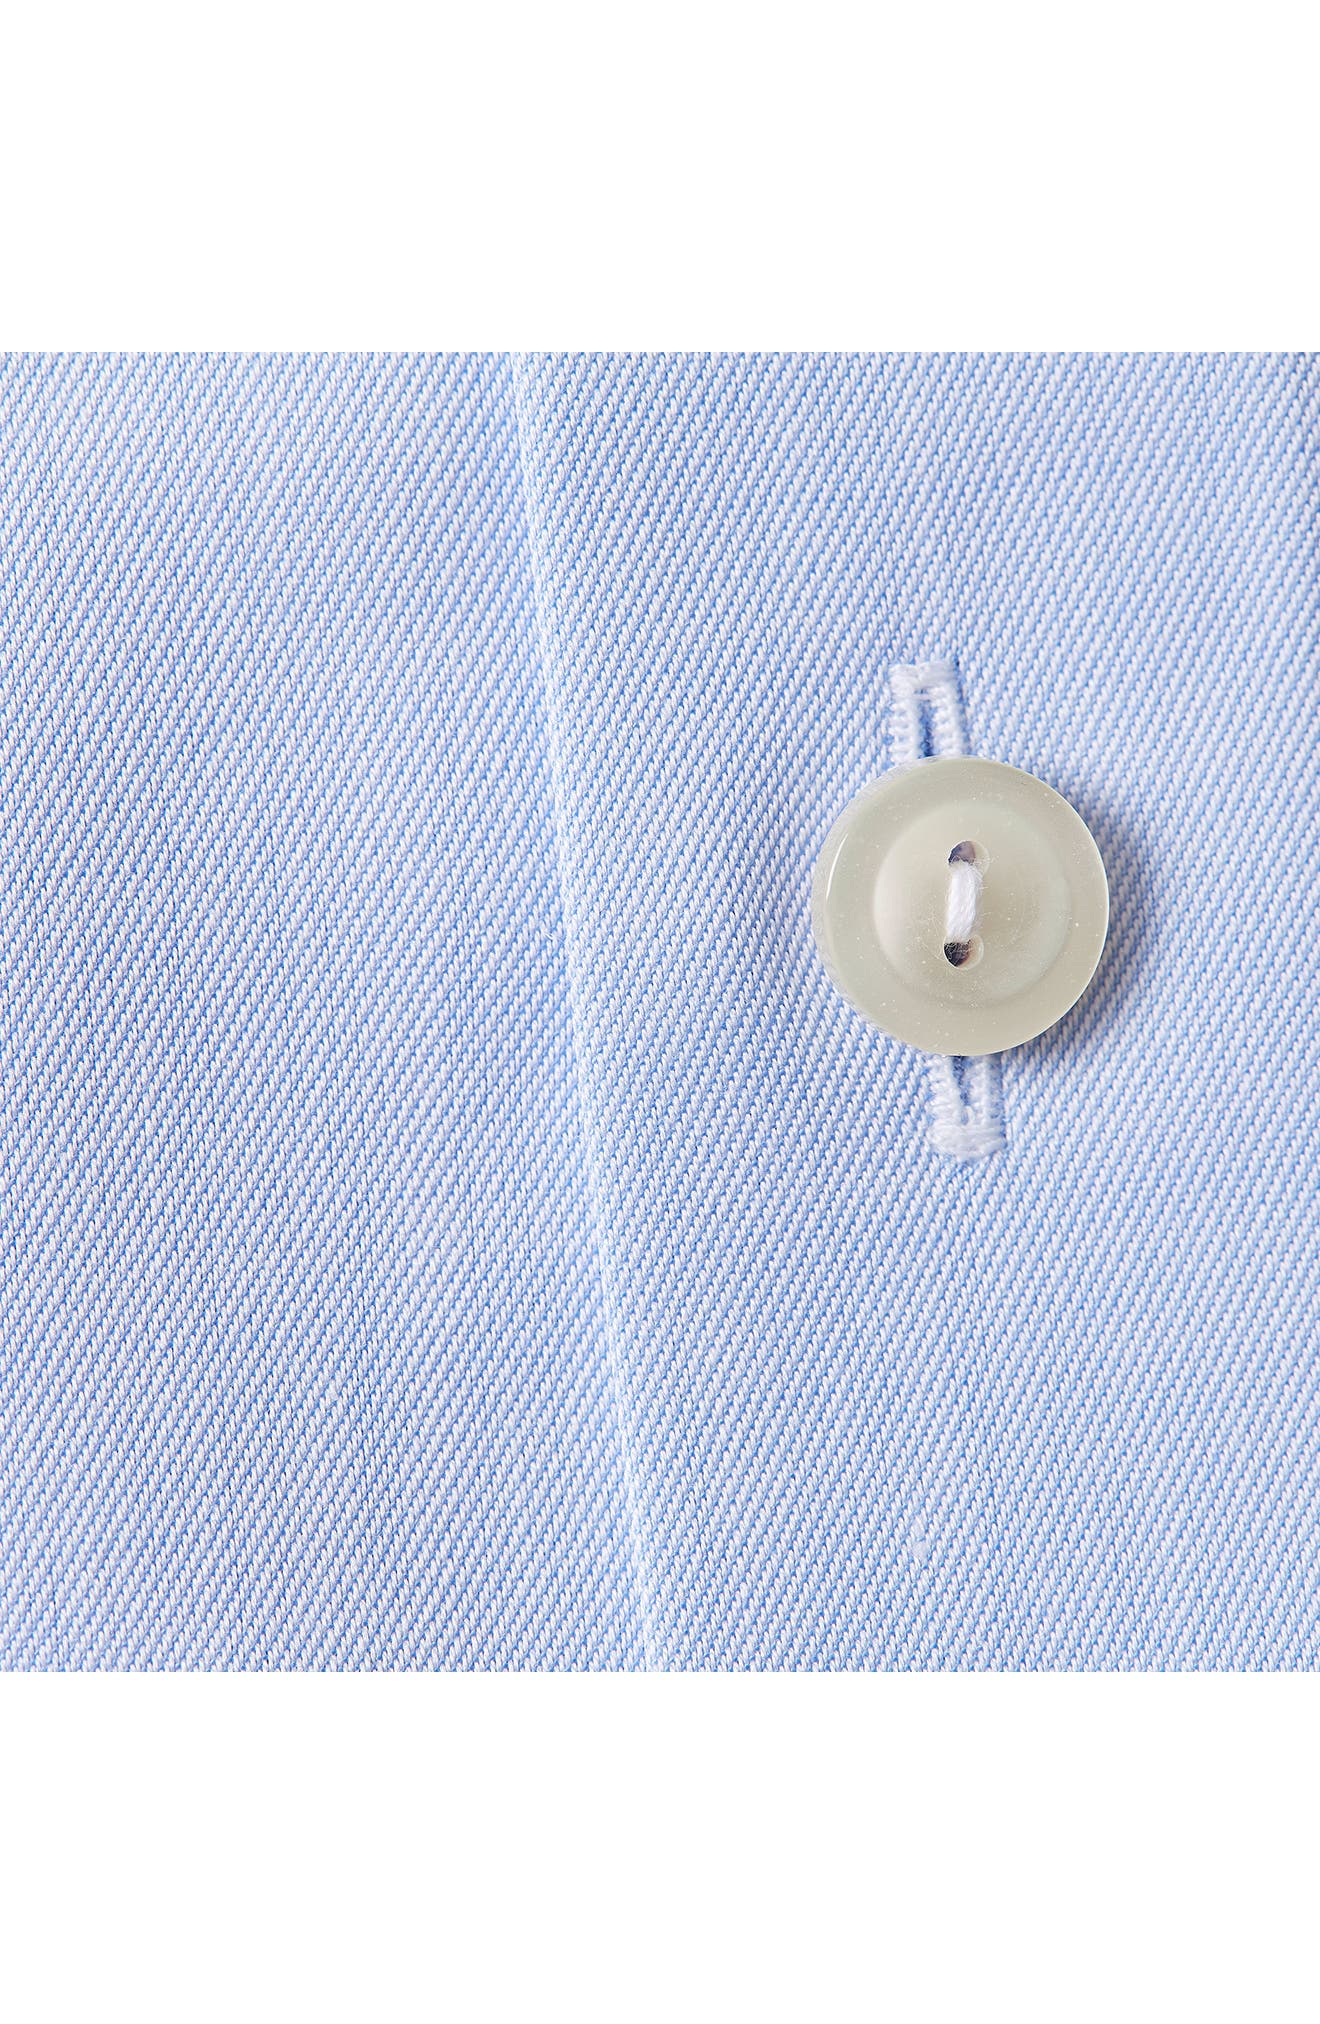 Classic Fit Twill Dress Shirt,                             Alternate thumbnail 3, color,                             Blue